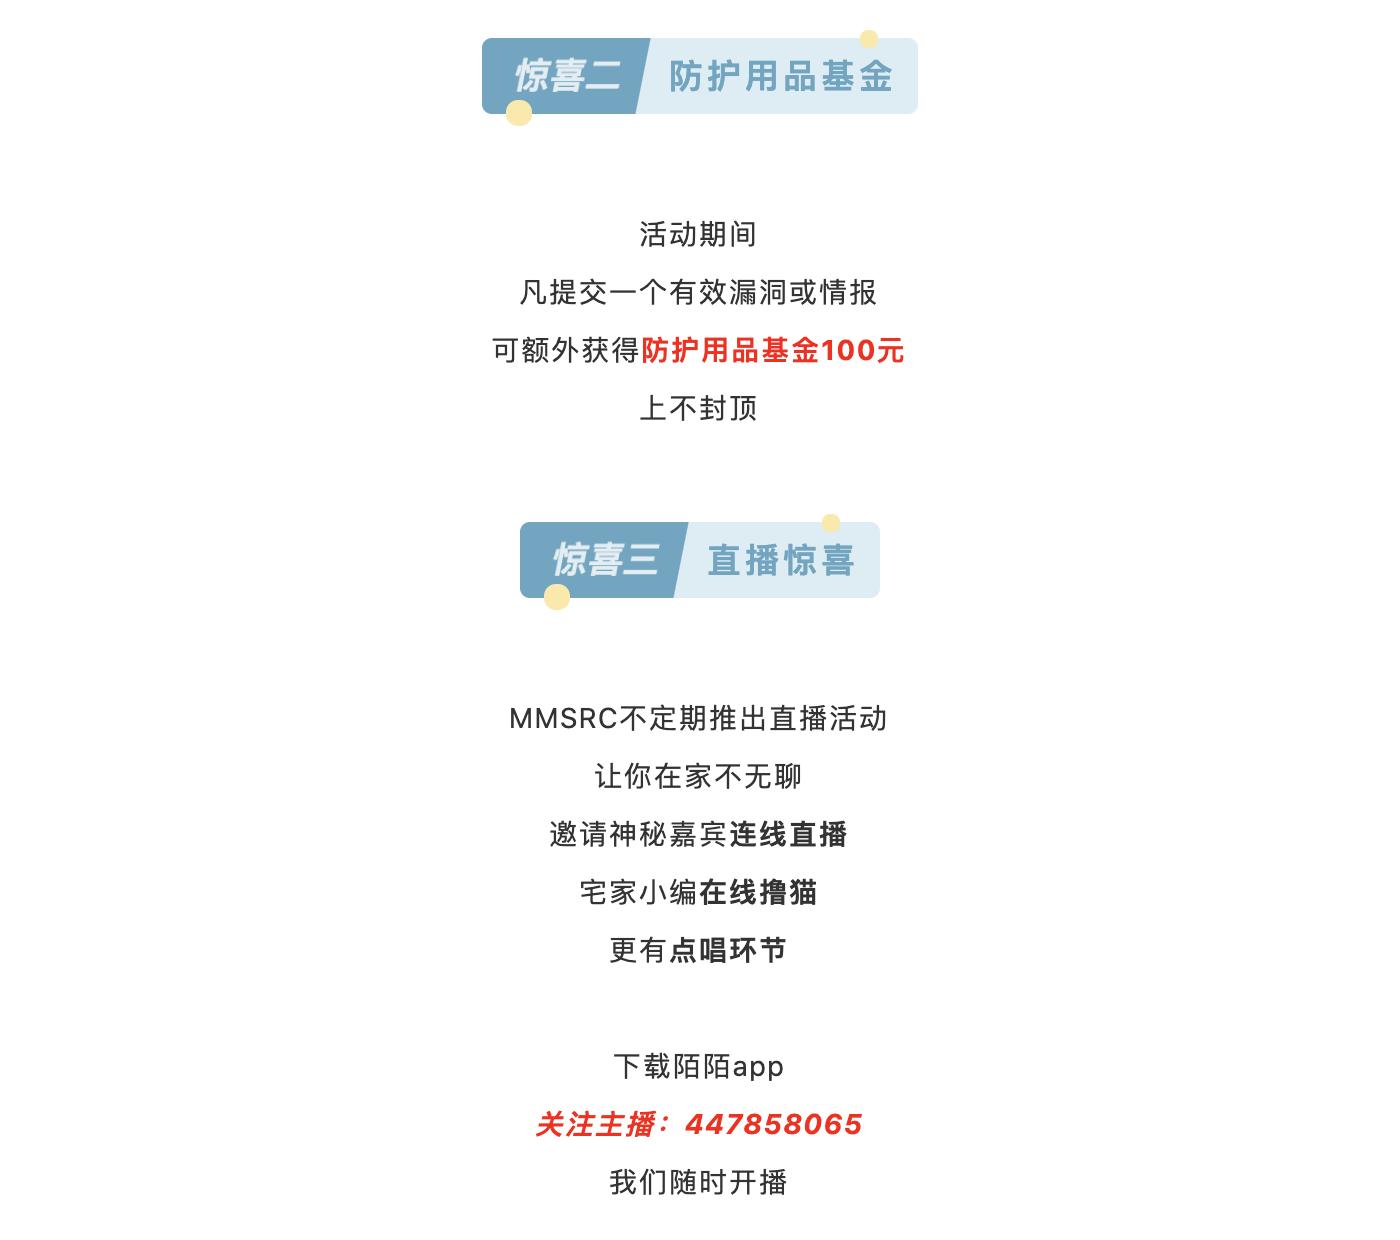 https://momo-mmsrc.oss-cn-hangzhou.aliyuncs.com/img-63c7118d-6093-3c53-93c1-a833e6b4aef8.png